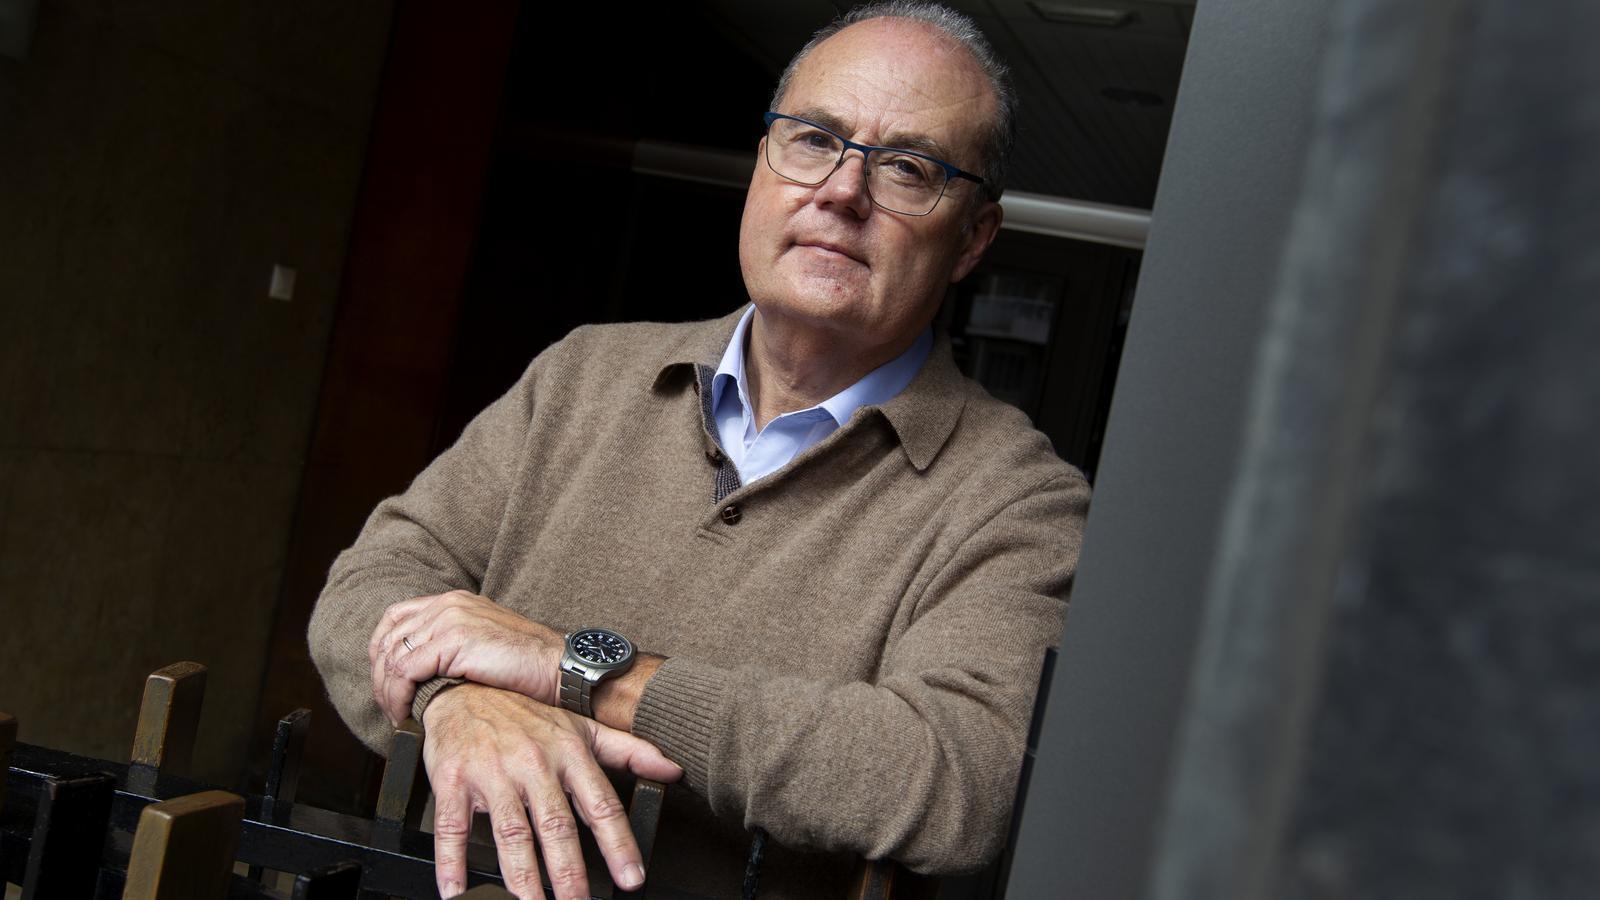 Doctor Antoni Trilla